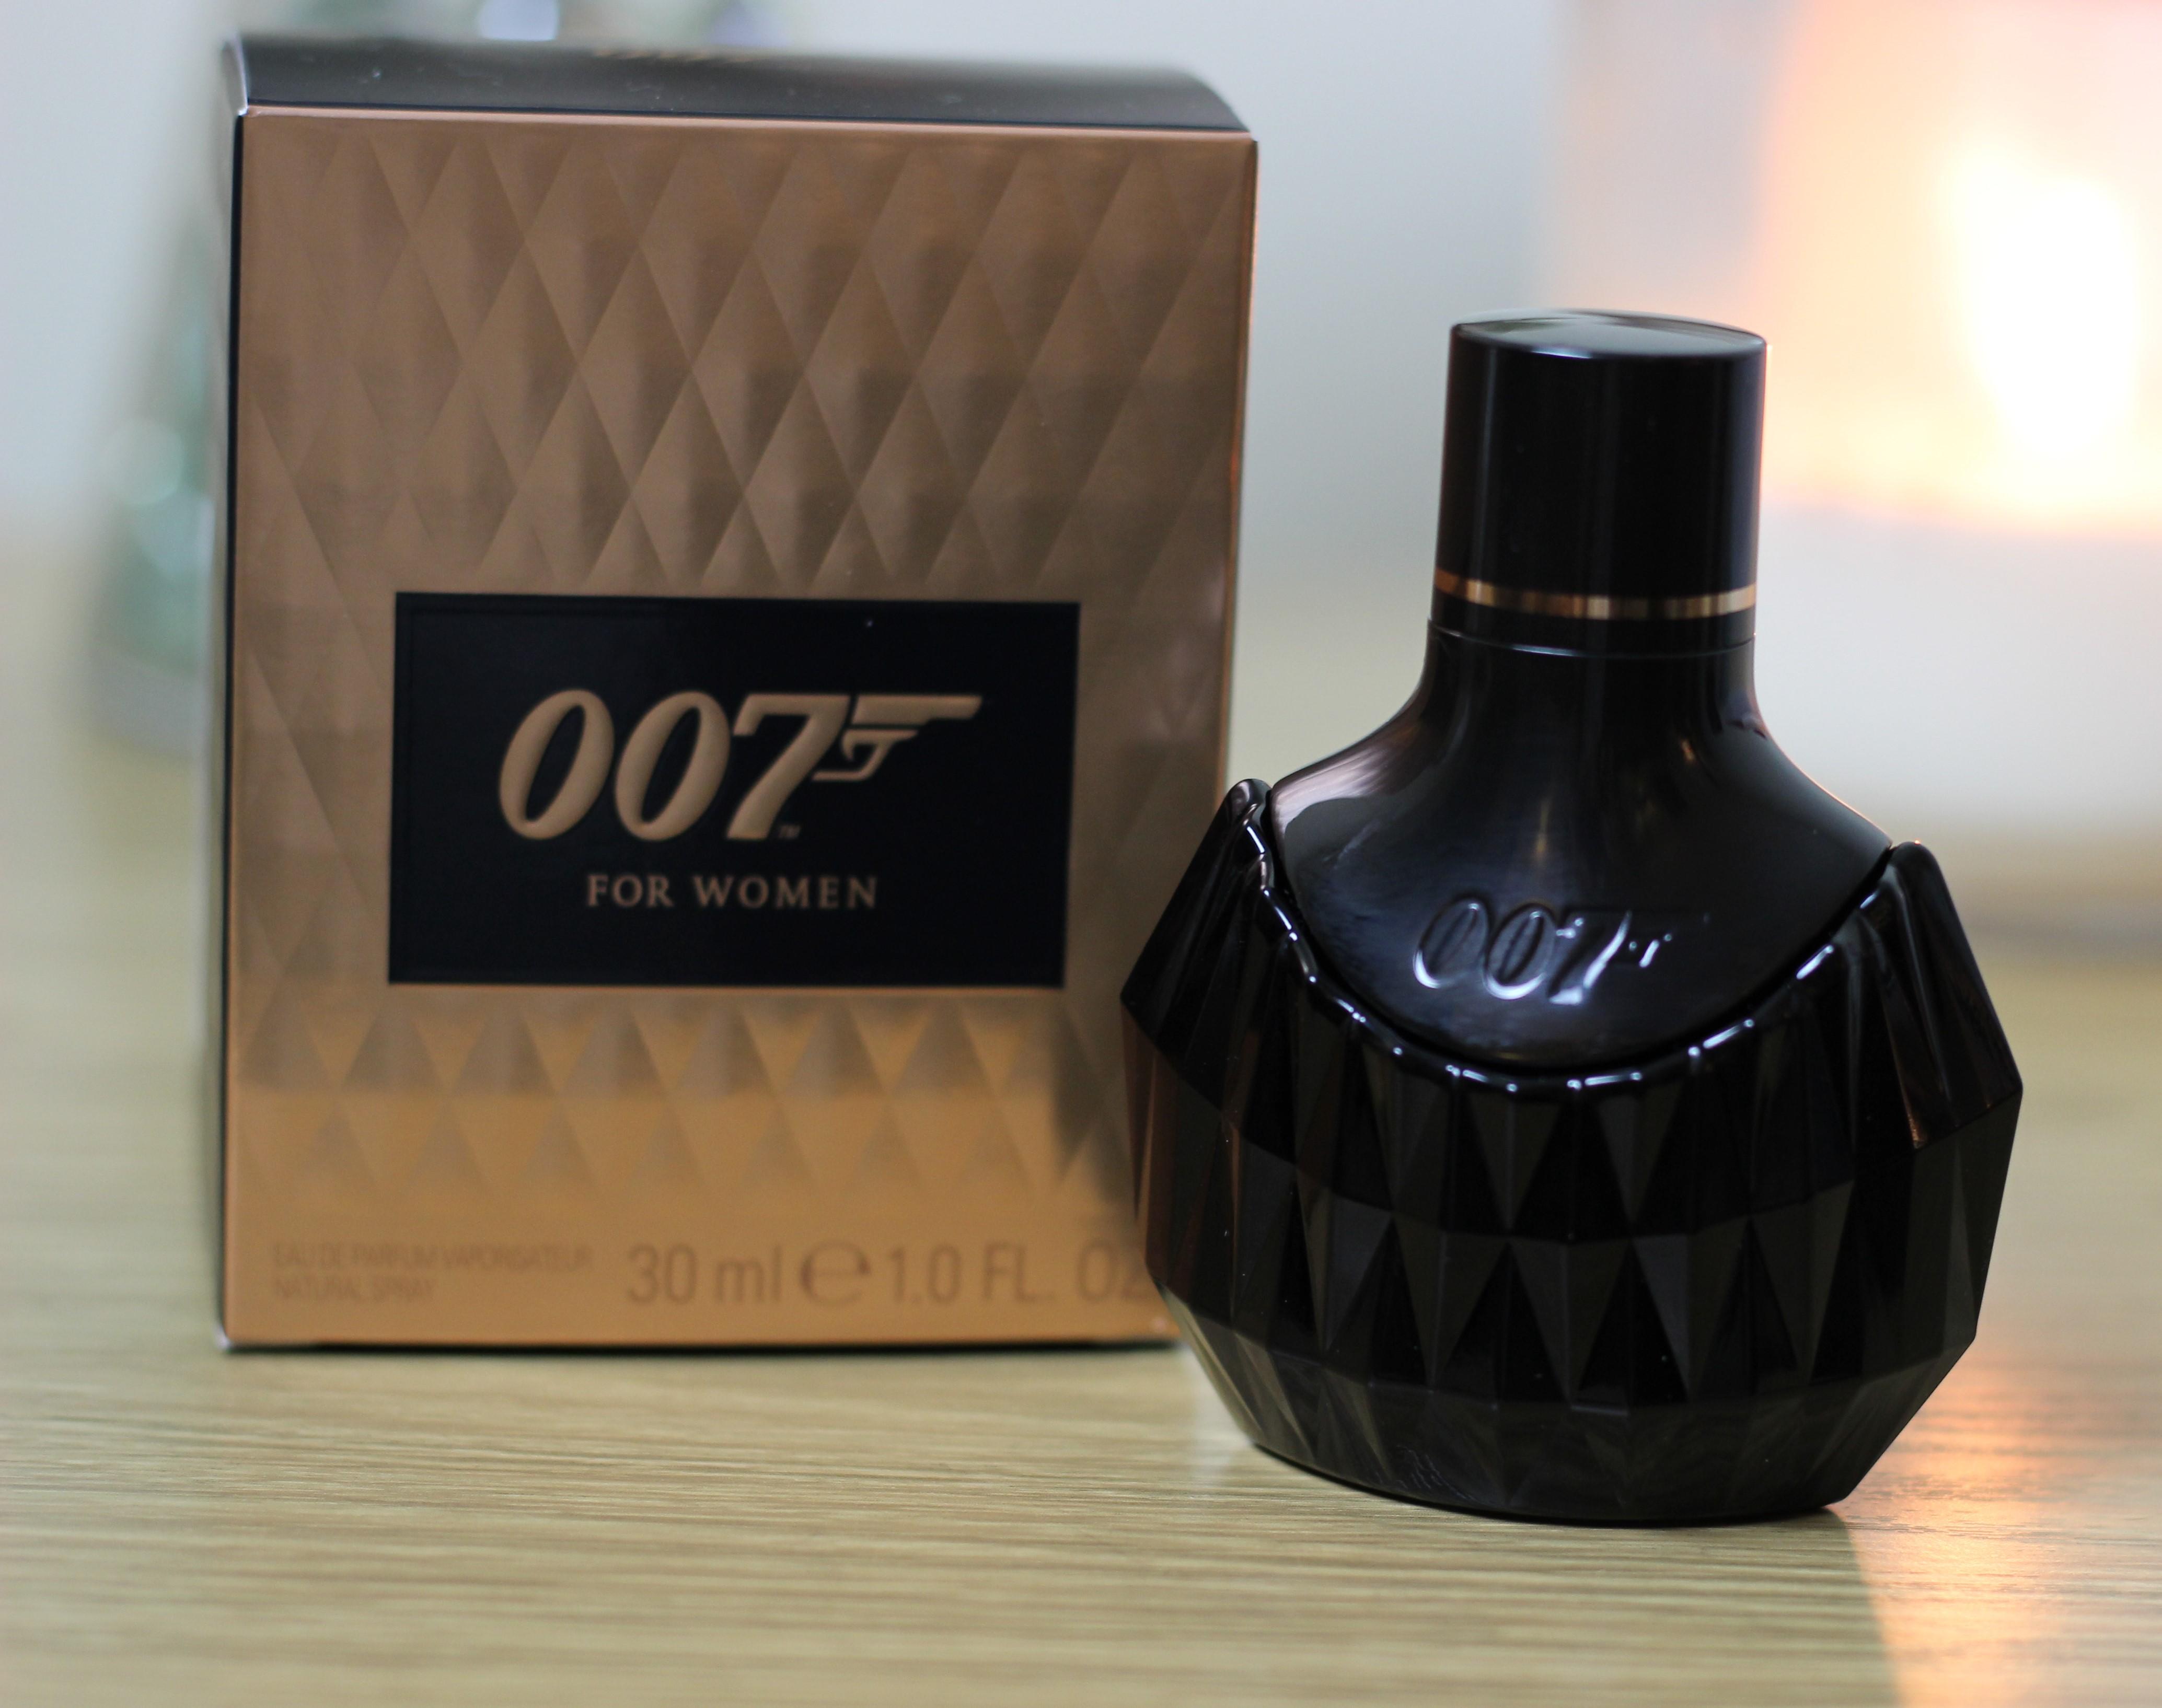 james bond 007 for women eau de parfum anoushka loves. Black Bedroom Furniture Sets. Home Design Ideas